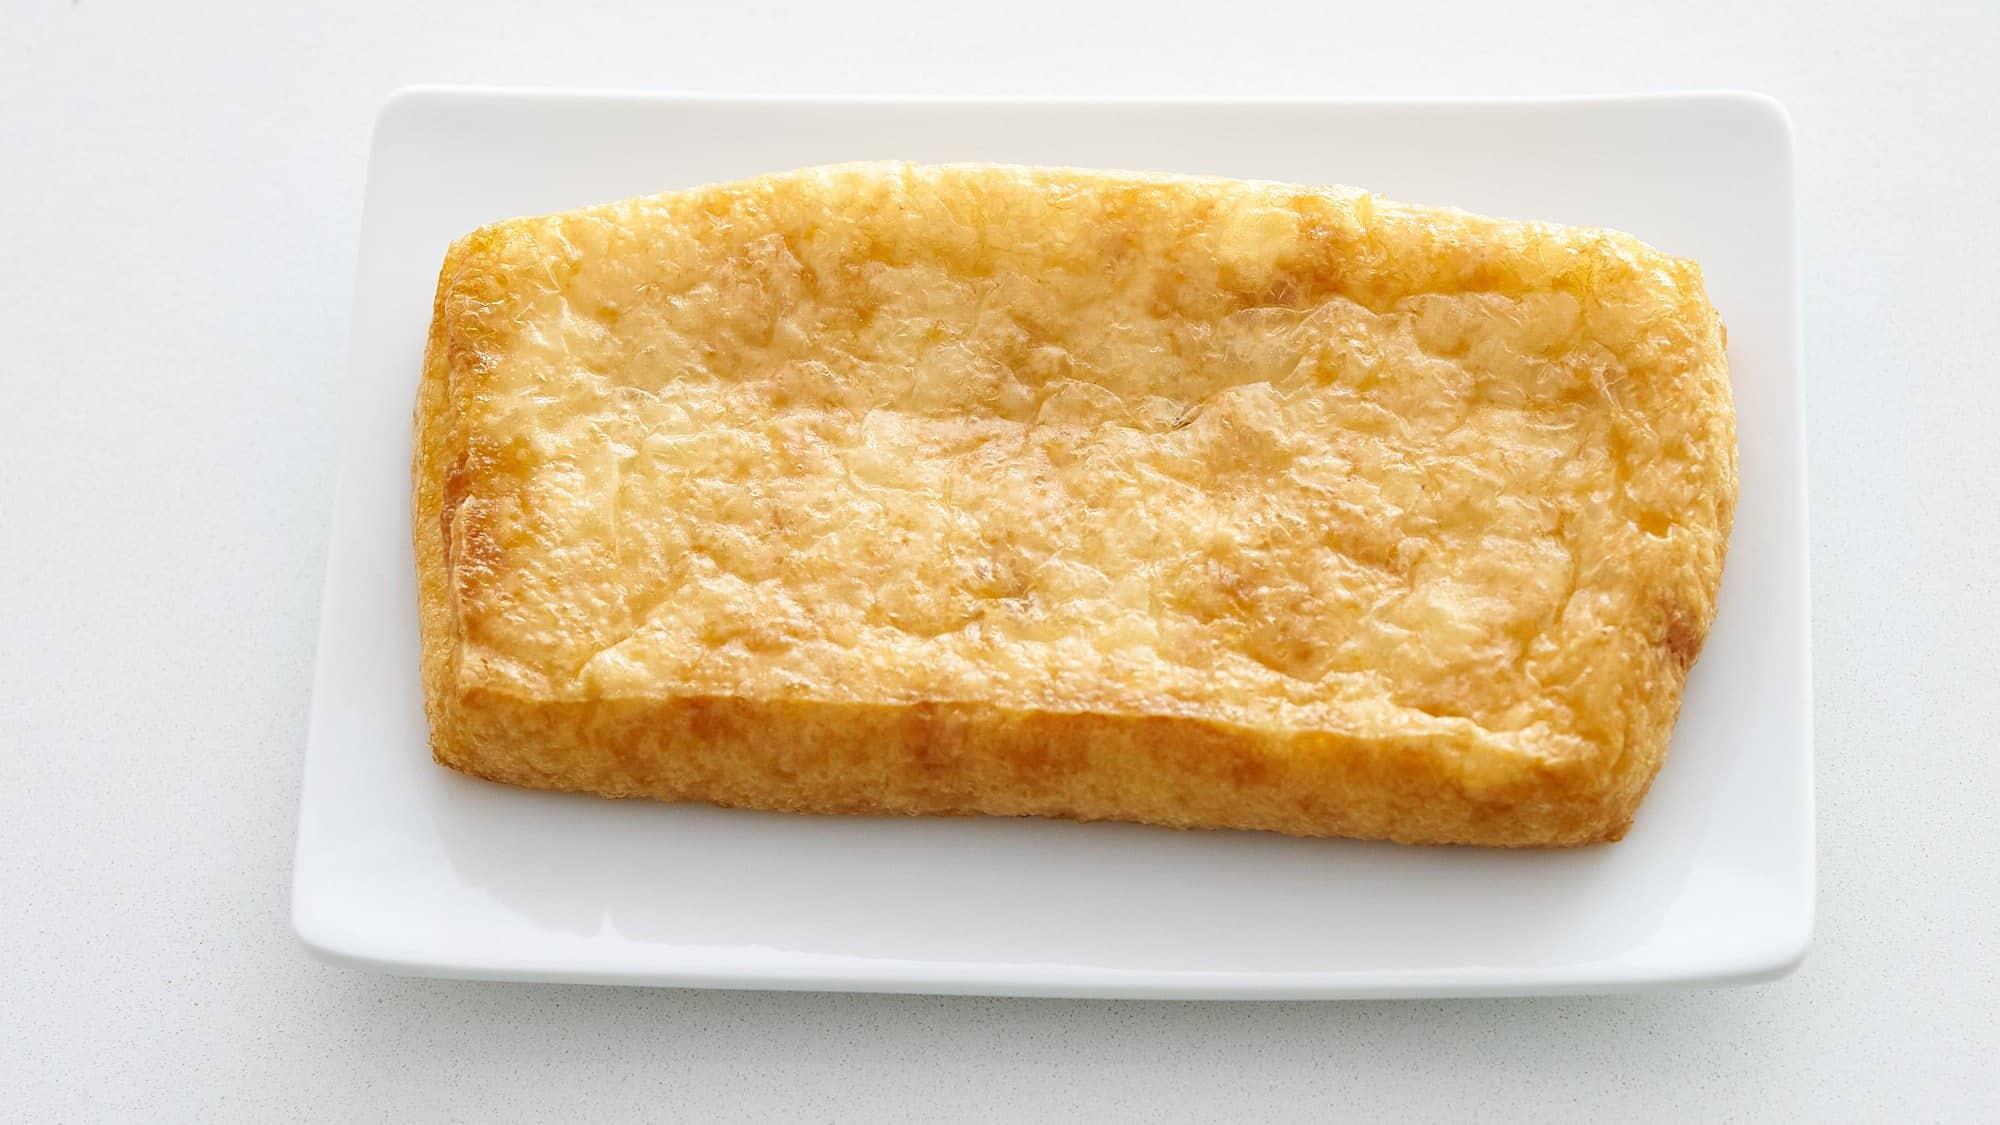 The inari in kitsune udon is made using abura-age (fried tofu).